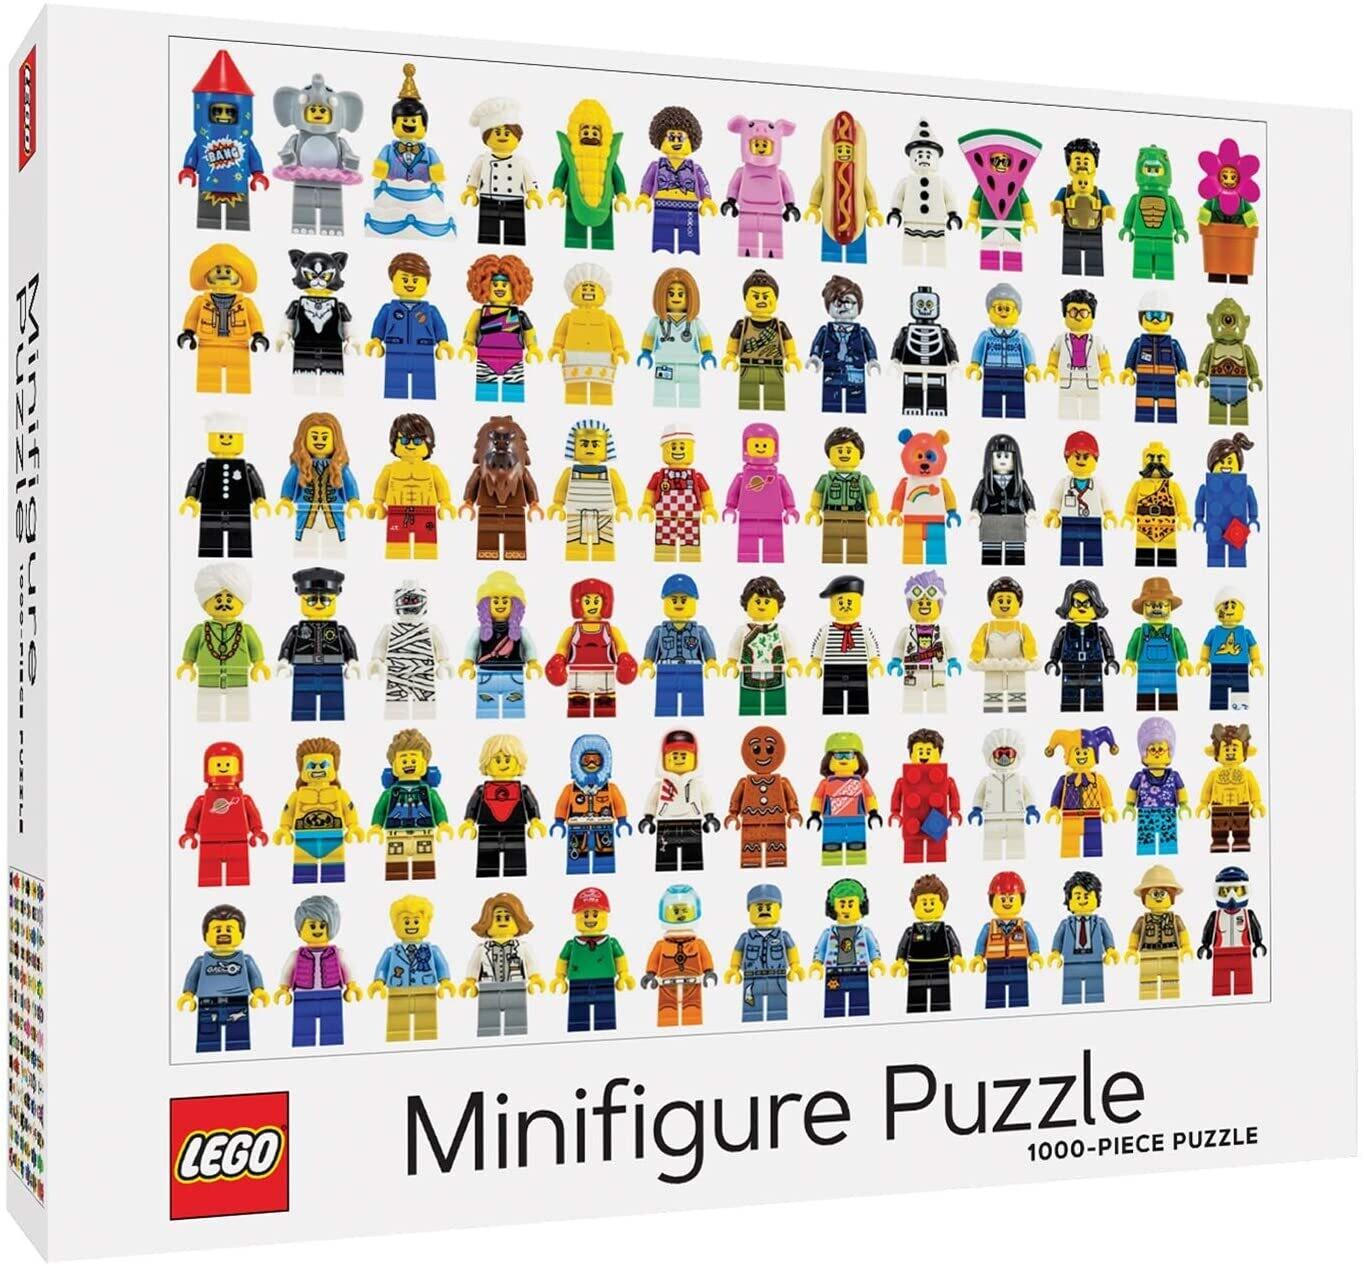 Lego Minifigure Puzzle 1000 Pc